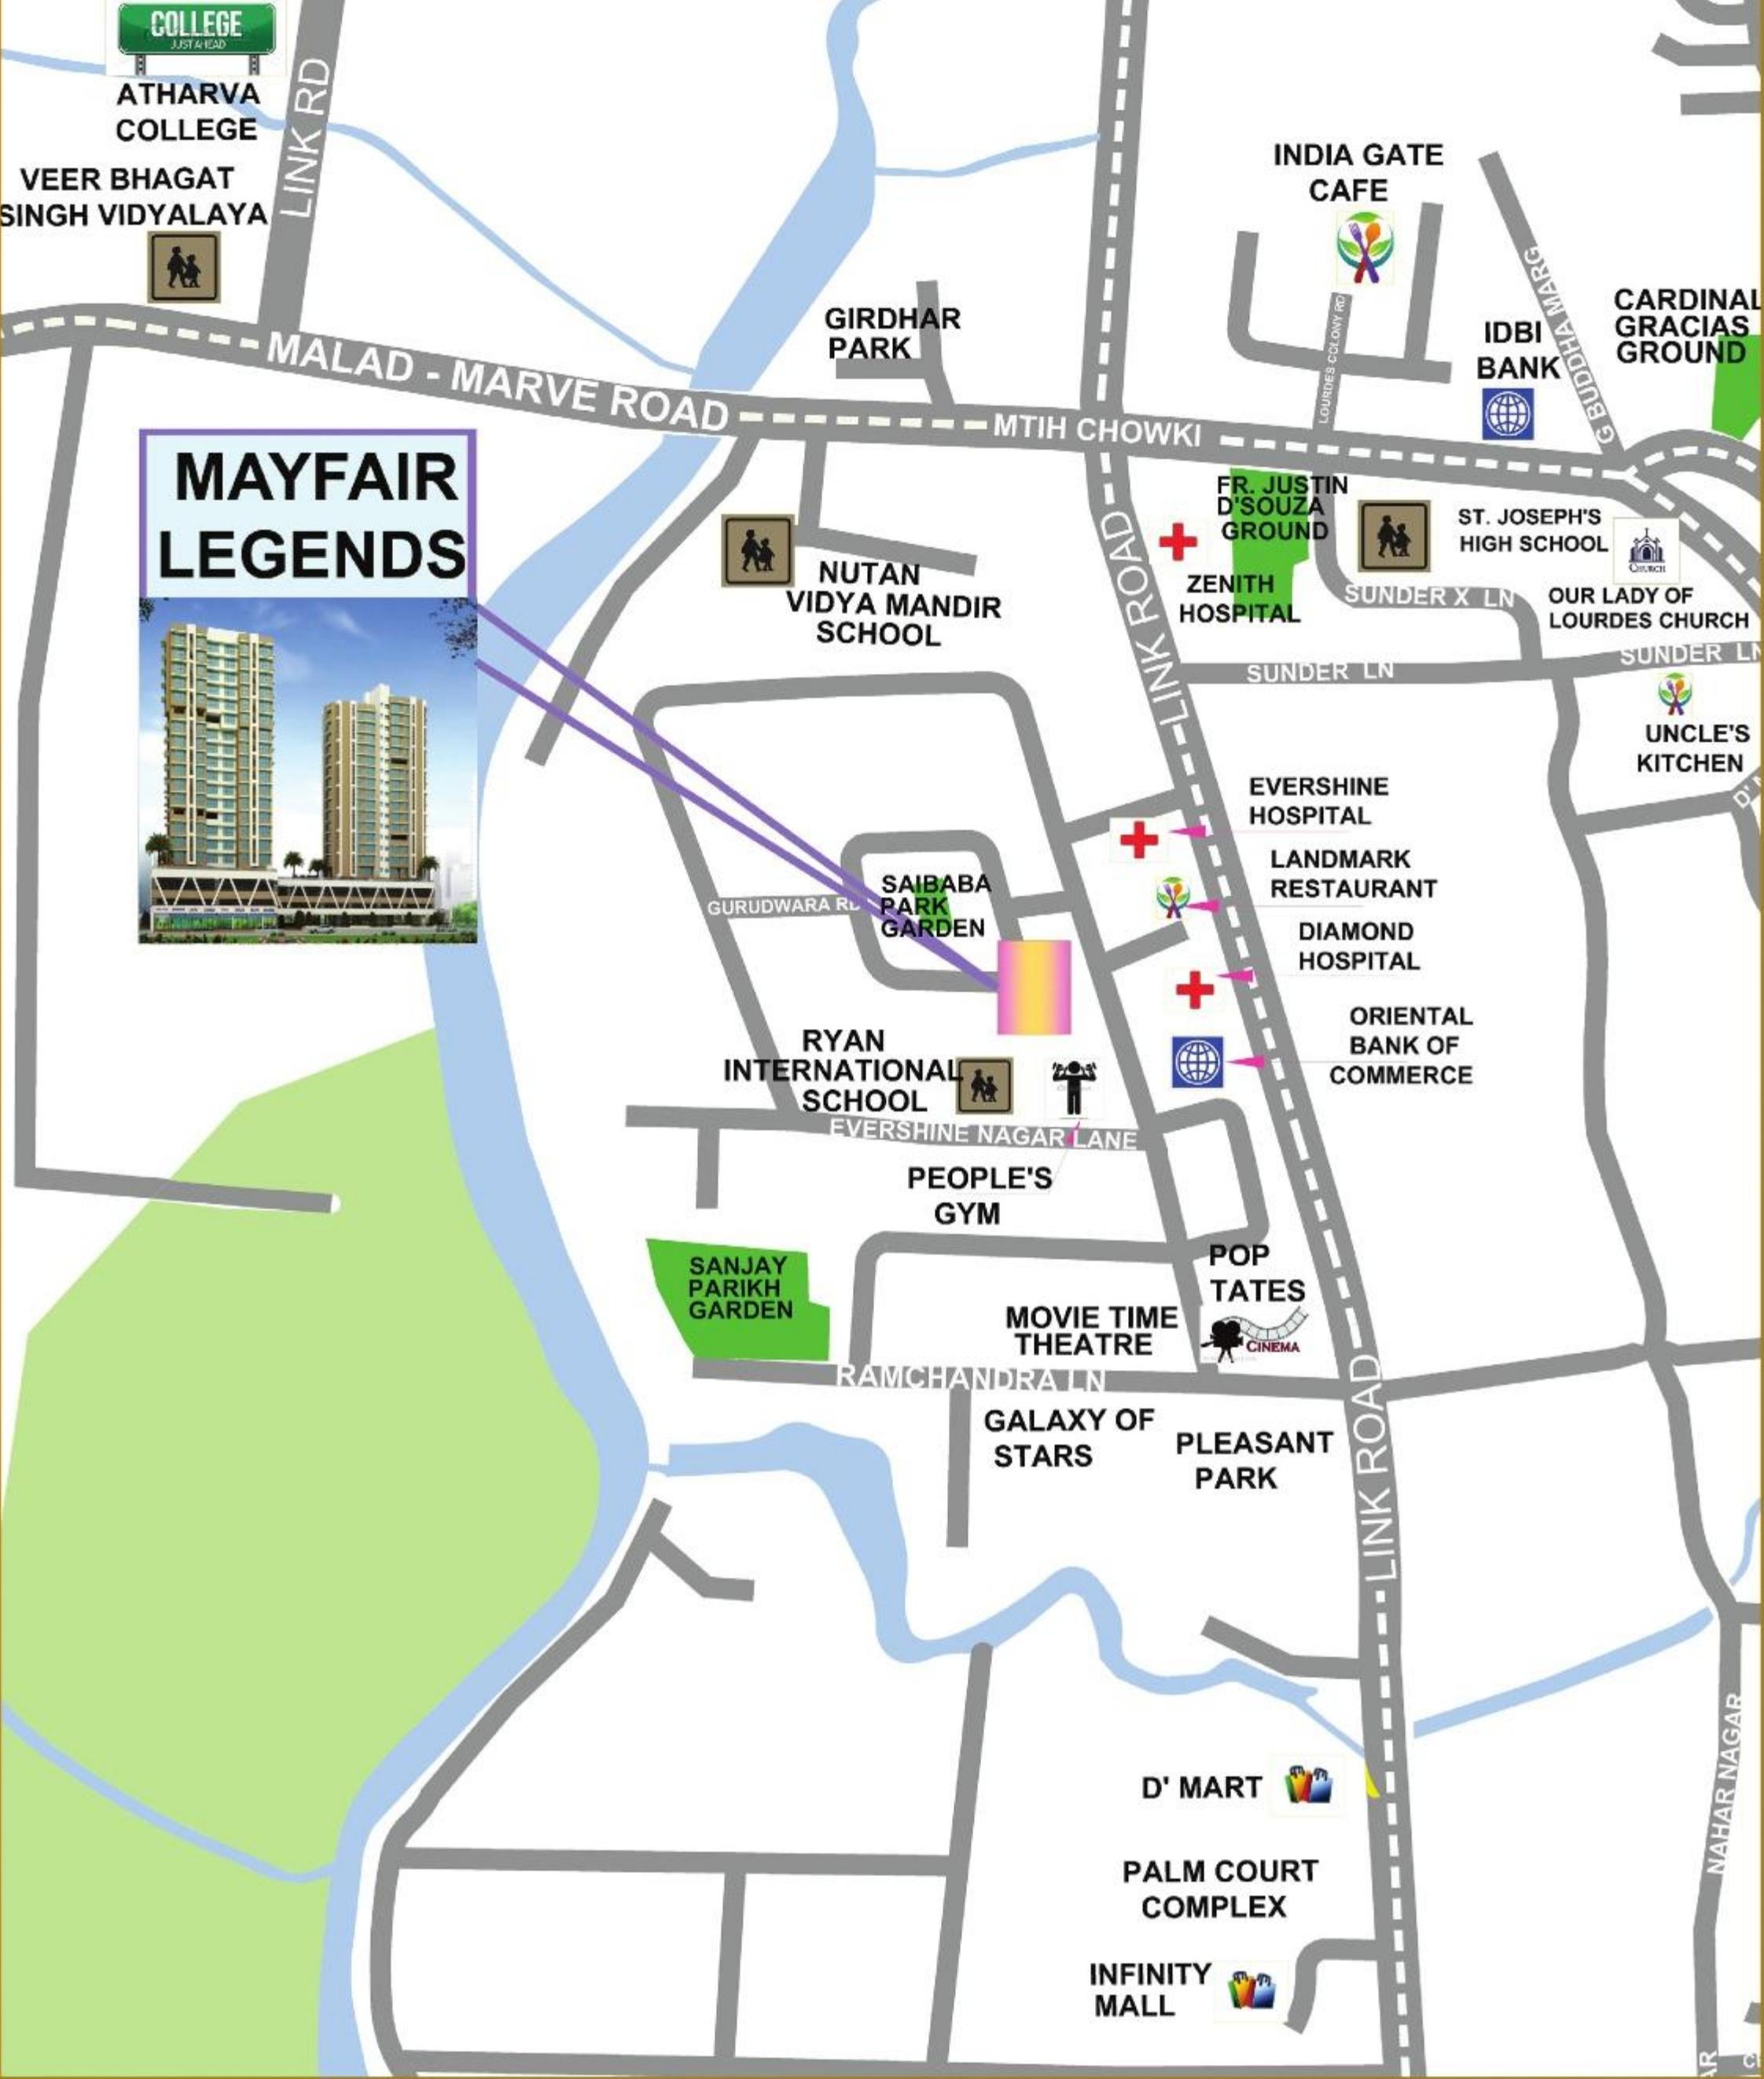 Myfair Com: Mayfair Legends In Malad West, Mumbai